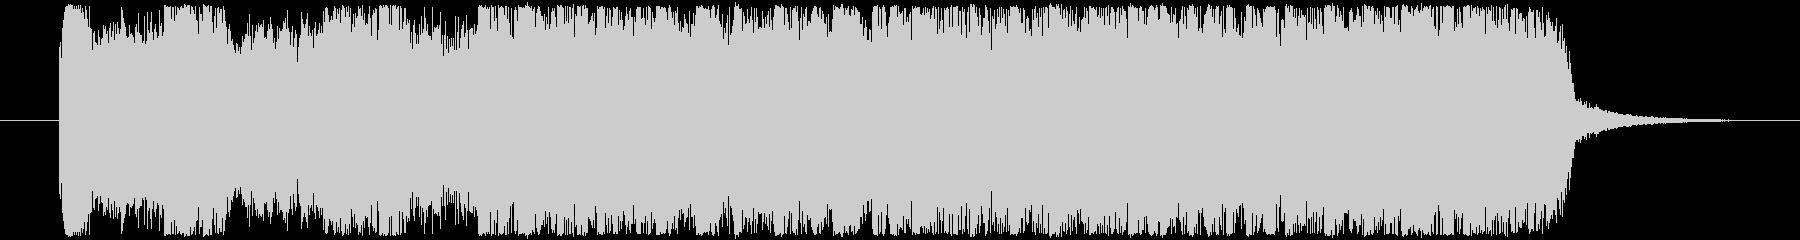 TVCM15秒サイズの勢い系の熱いロックの未再生の波形